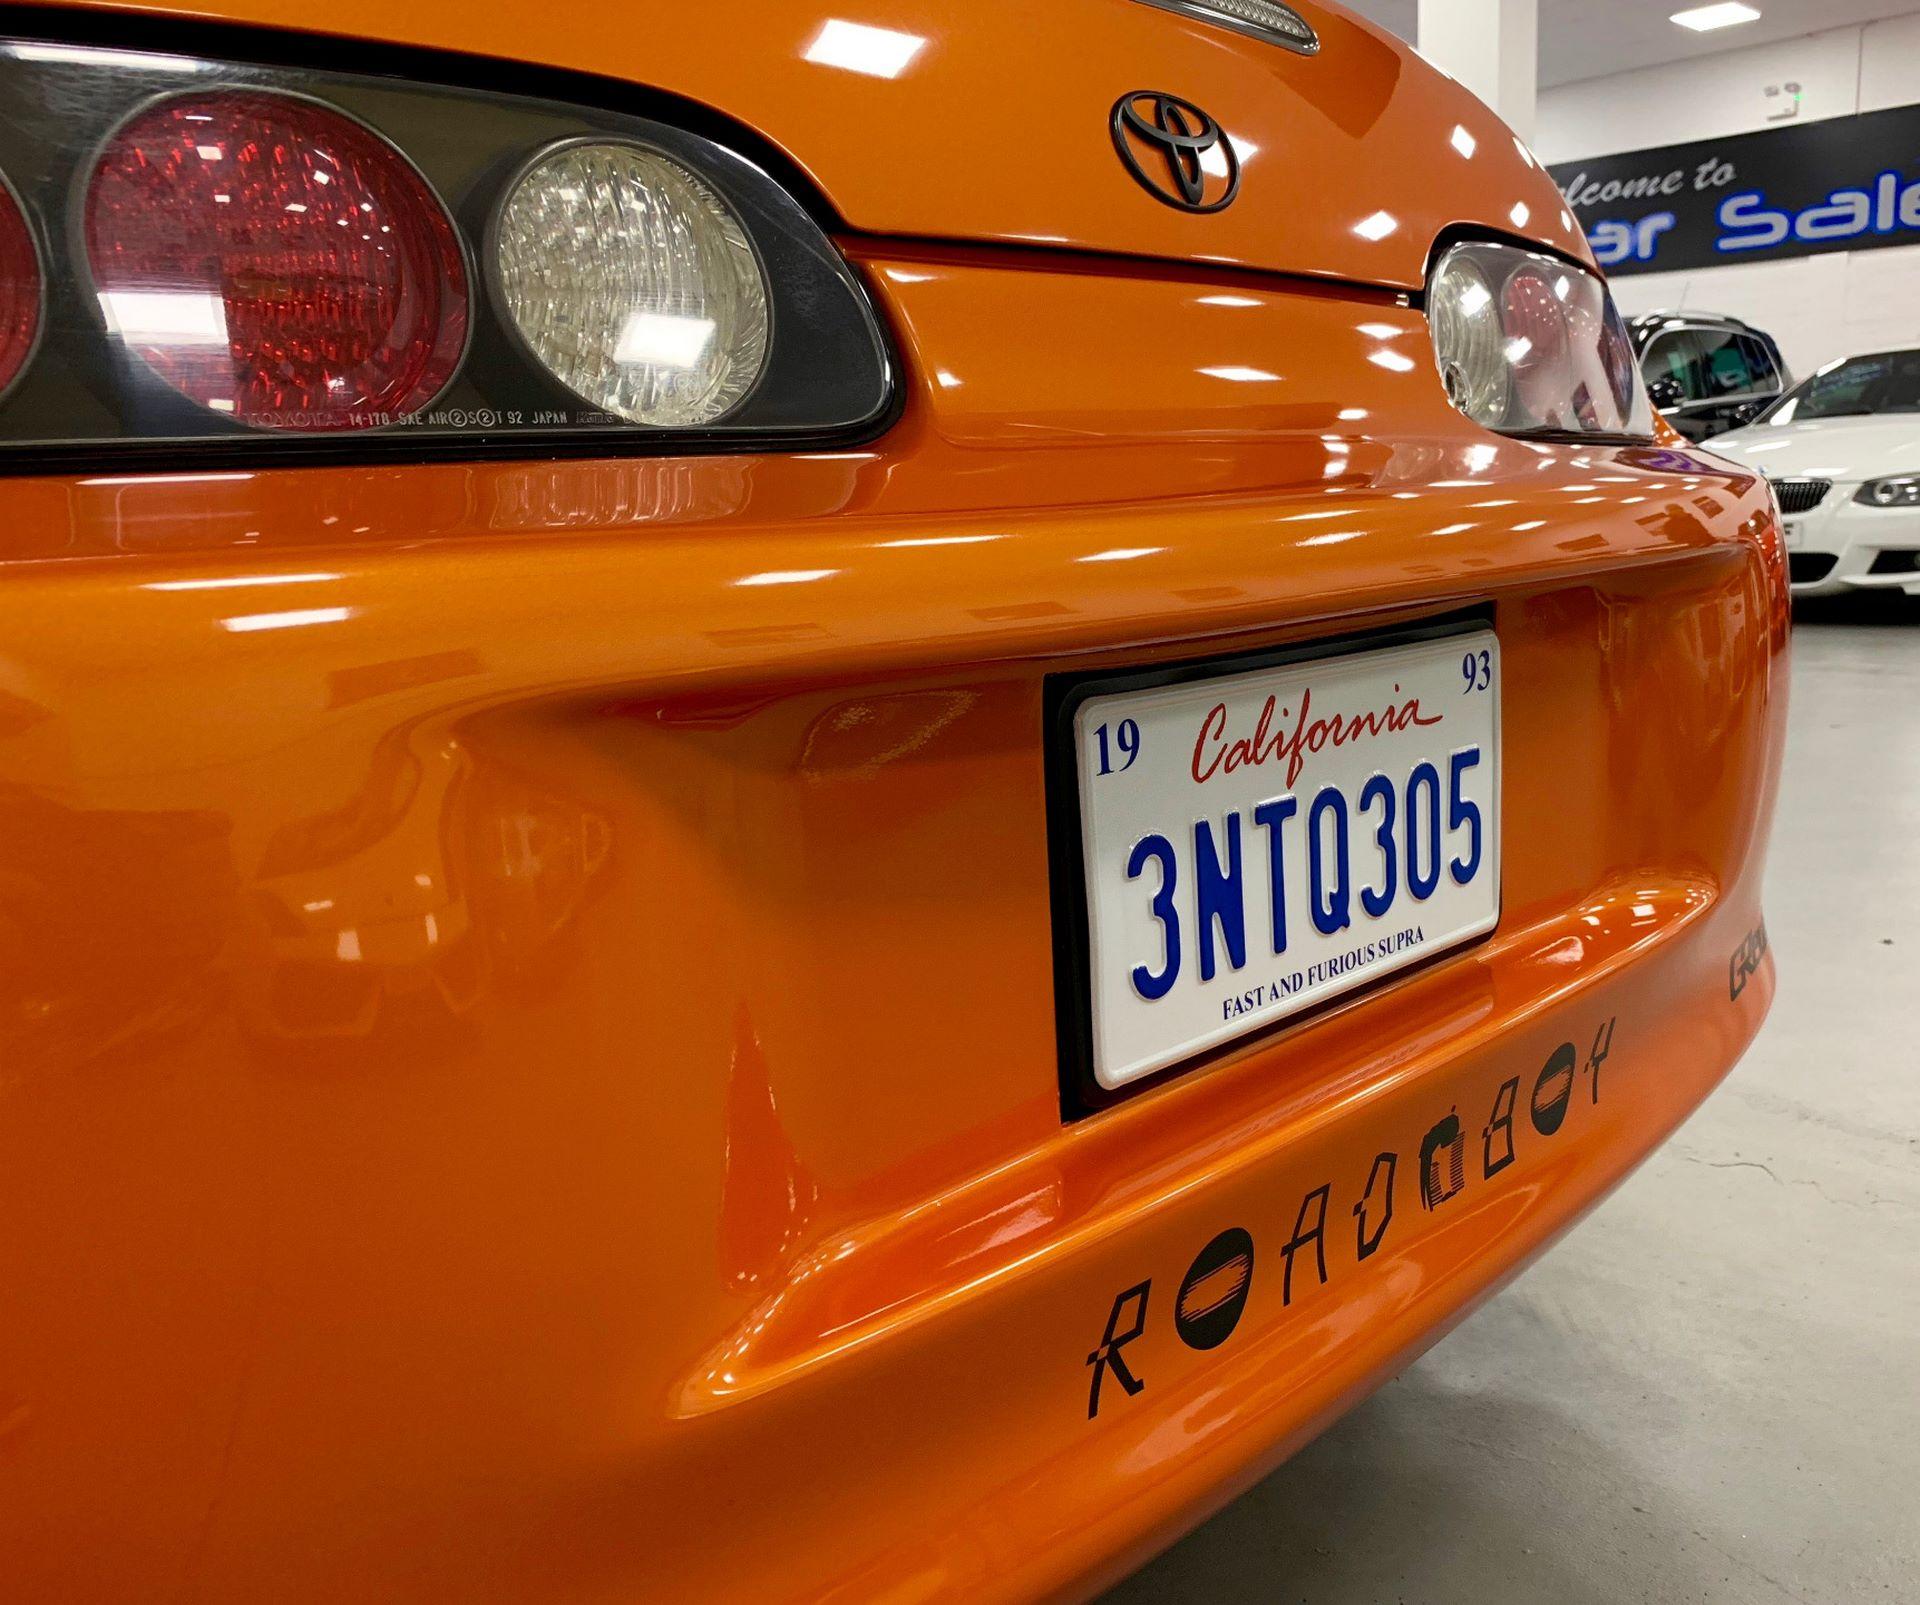 Toyota-Supra-replica-the-fast-and-the-furious-33